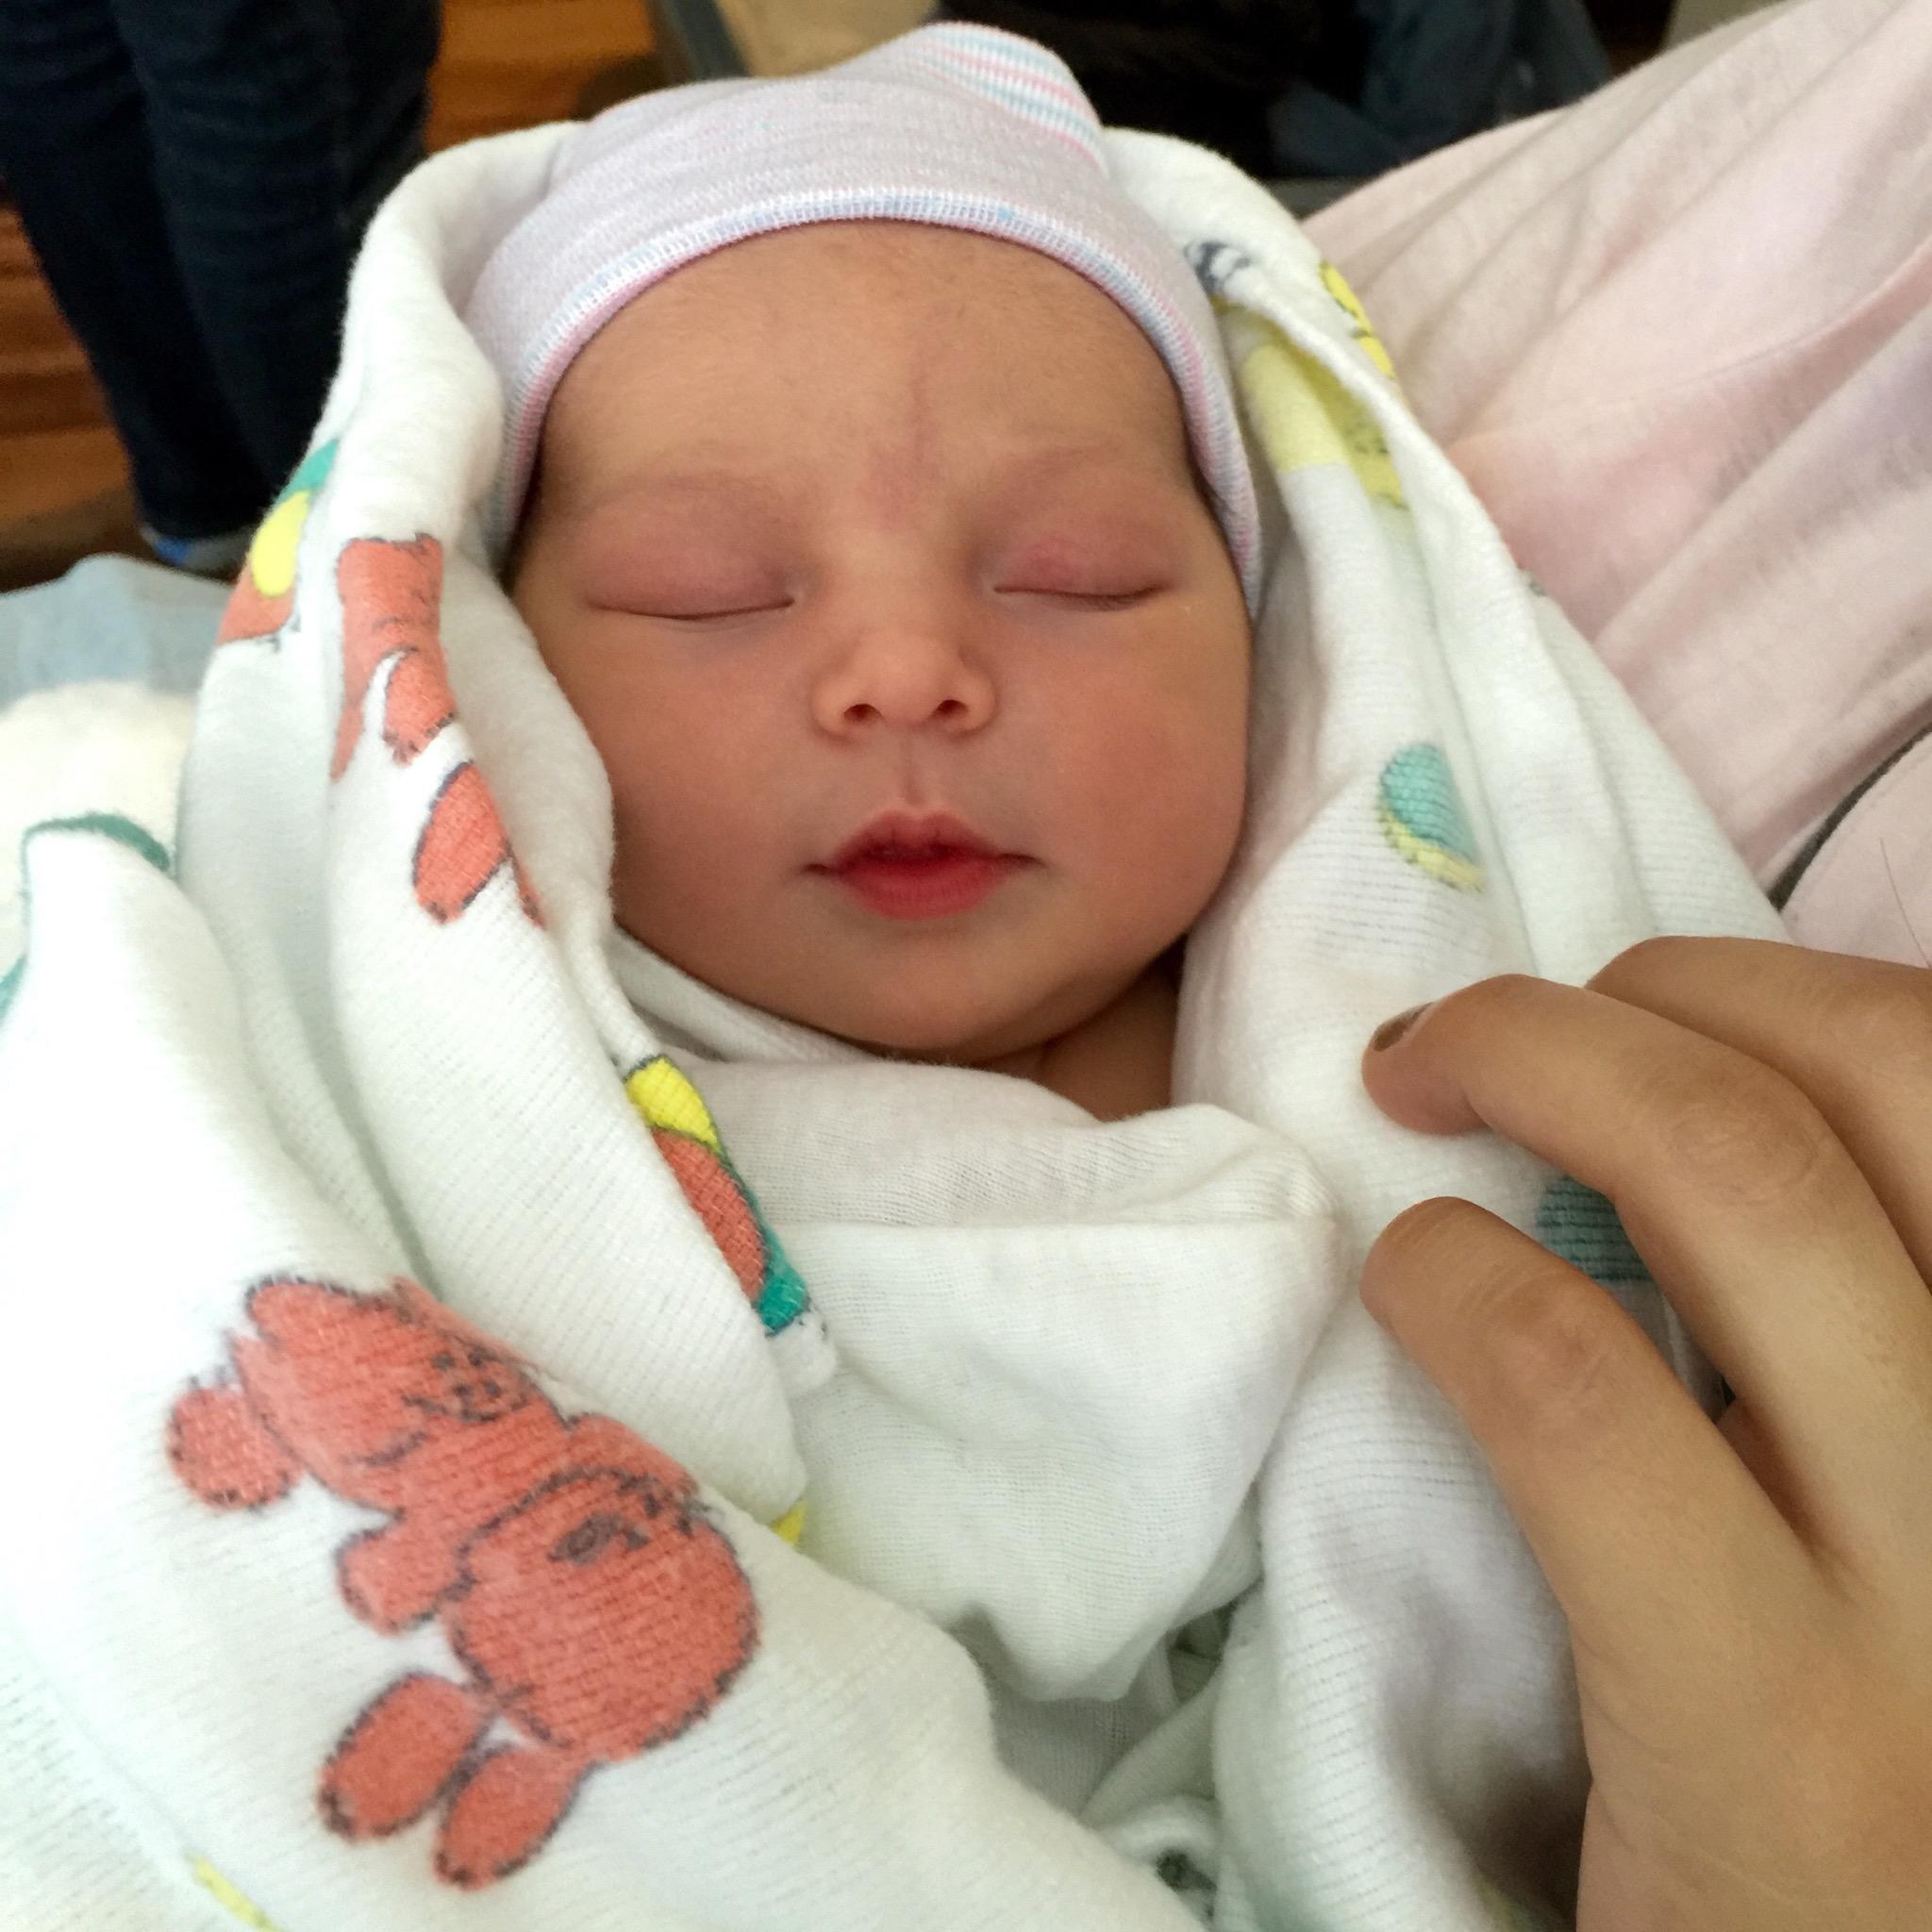 Newborn Baby Girl In Hospital Just Born | www.pixshark.com ...